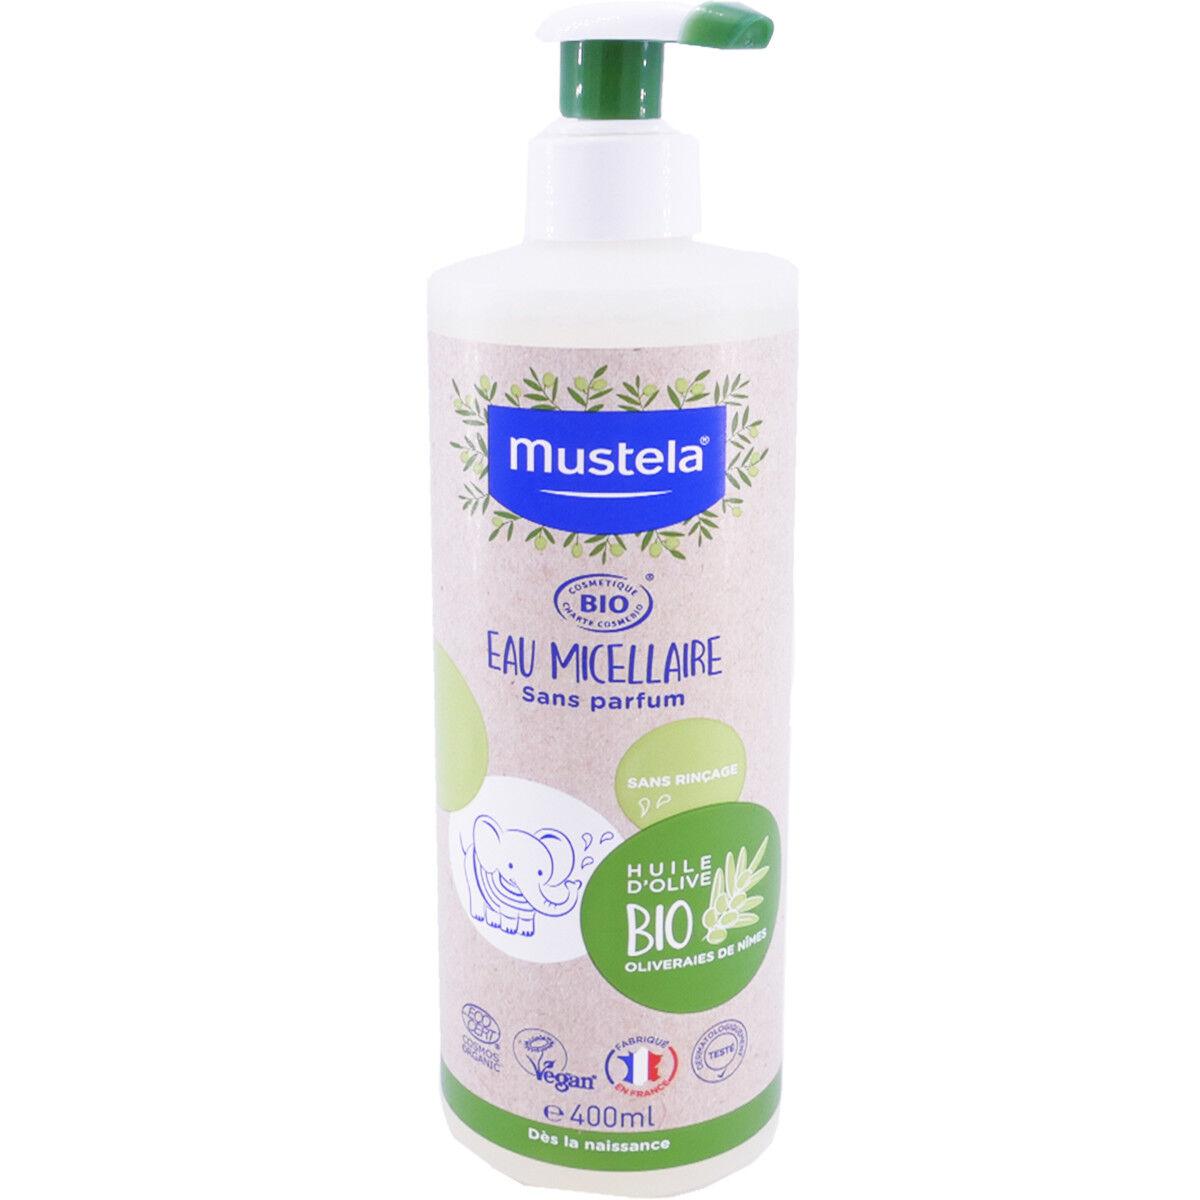 Mustela eau micellaire 400 ml bio